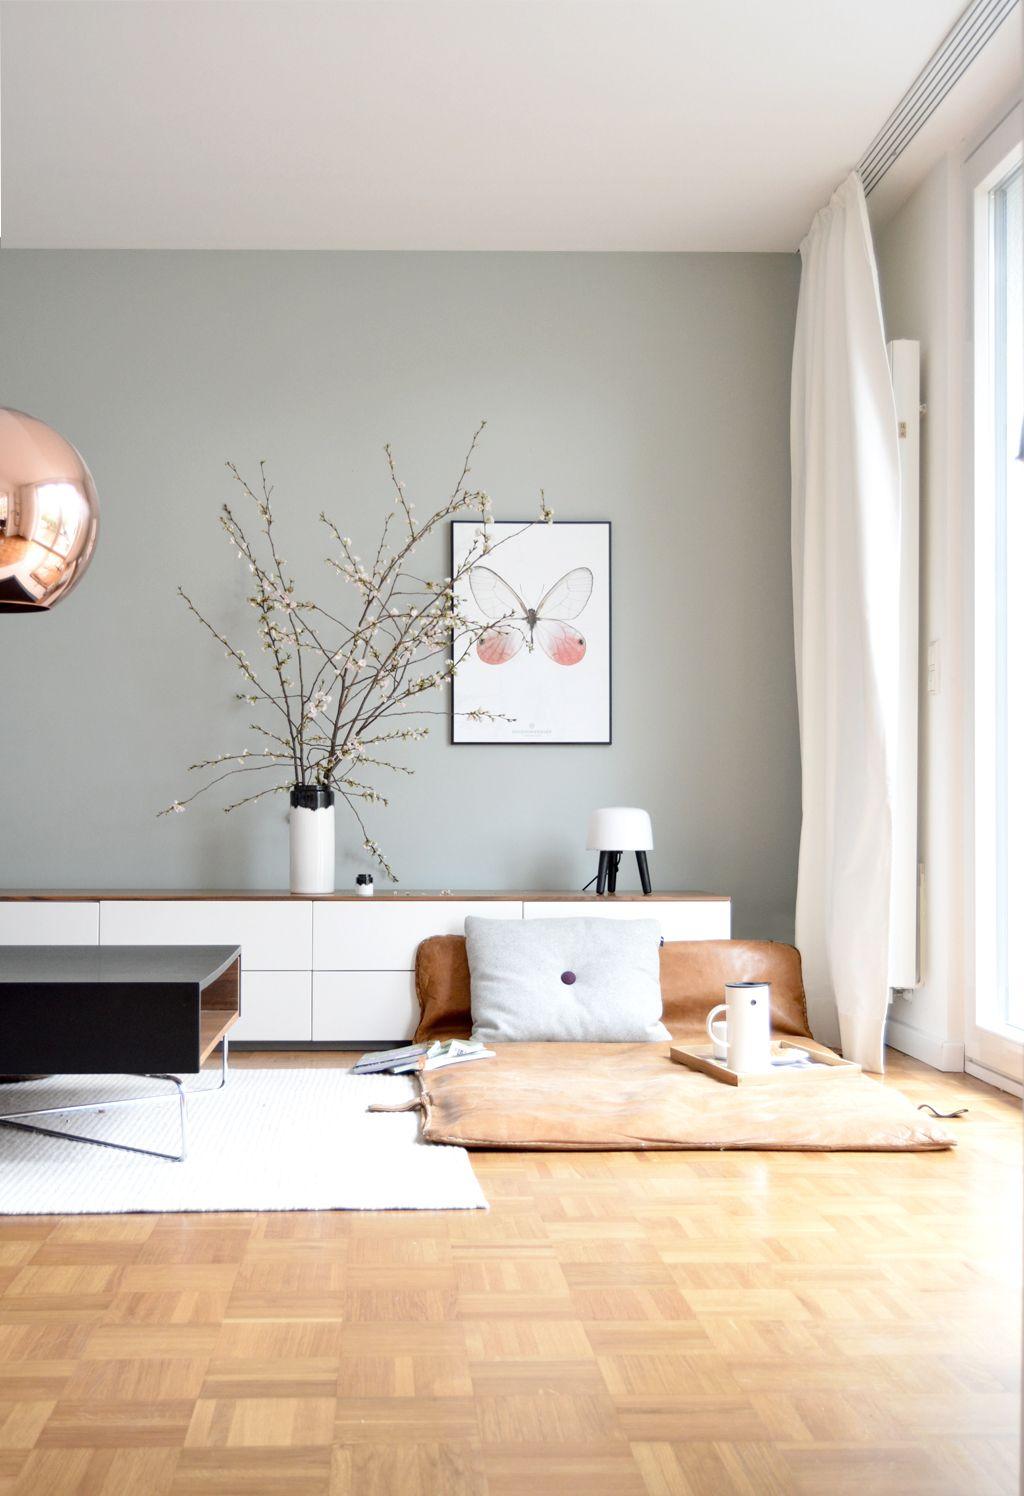 Pläne schmieden | Living rooms, Room and Interiors